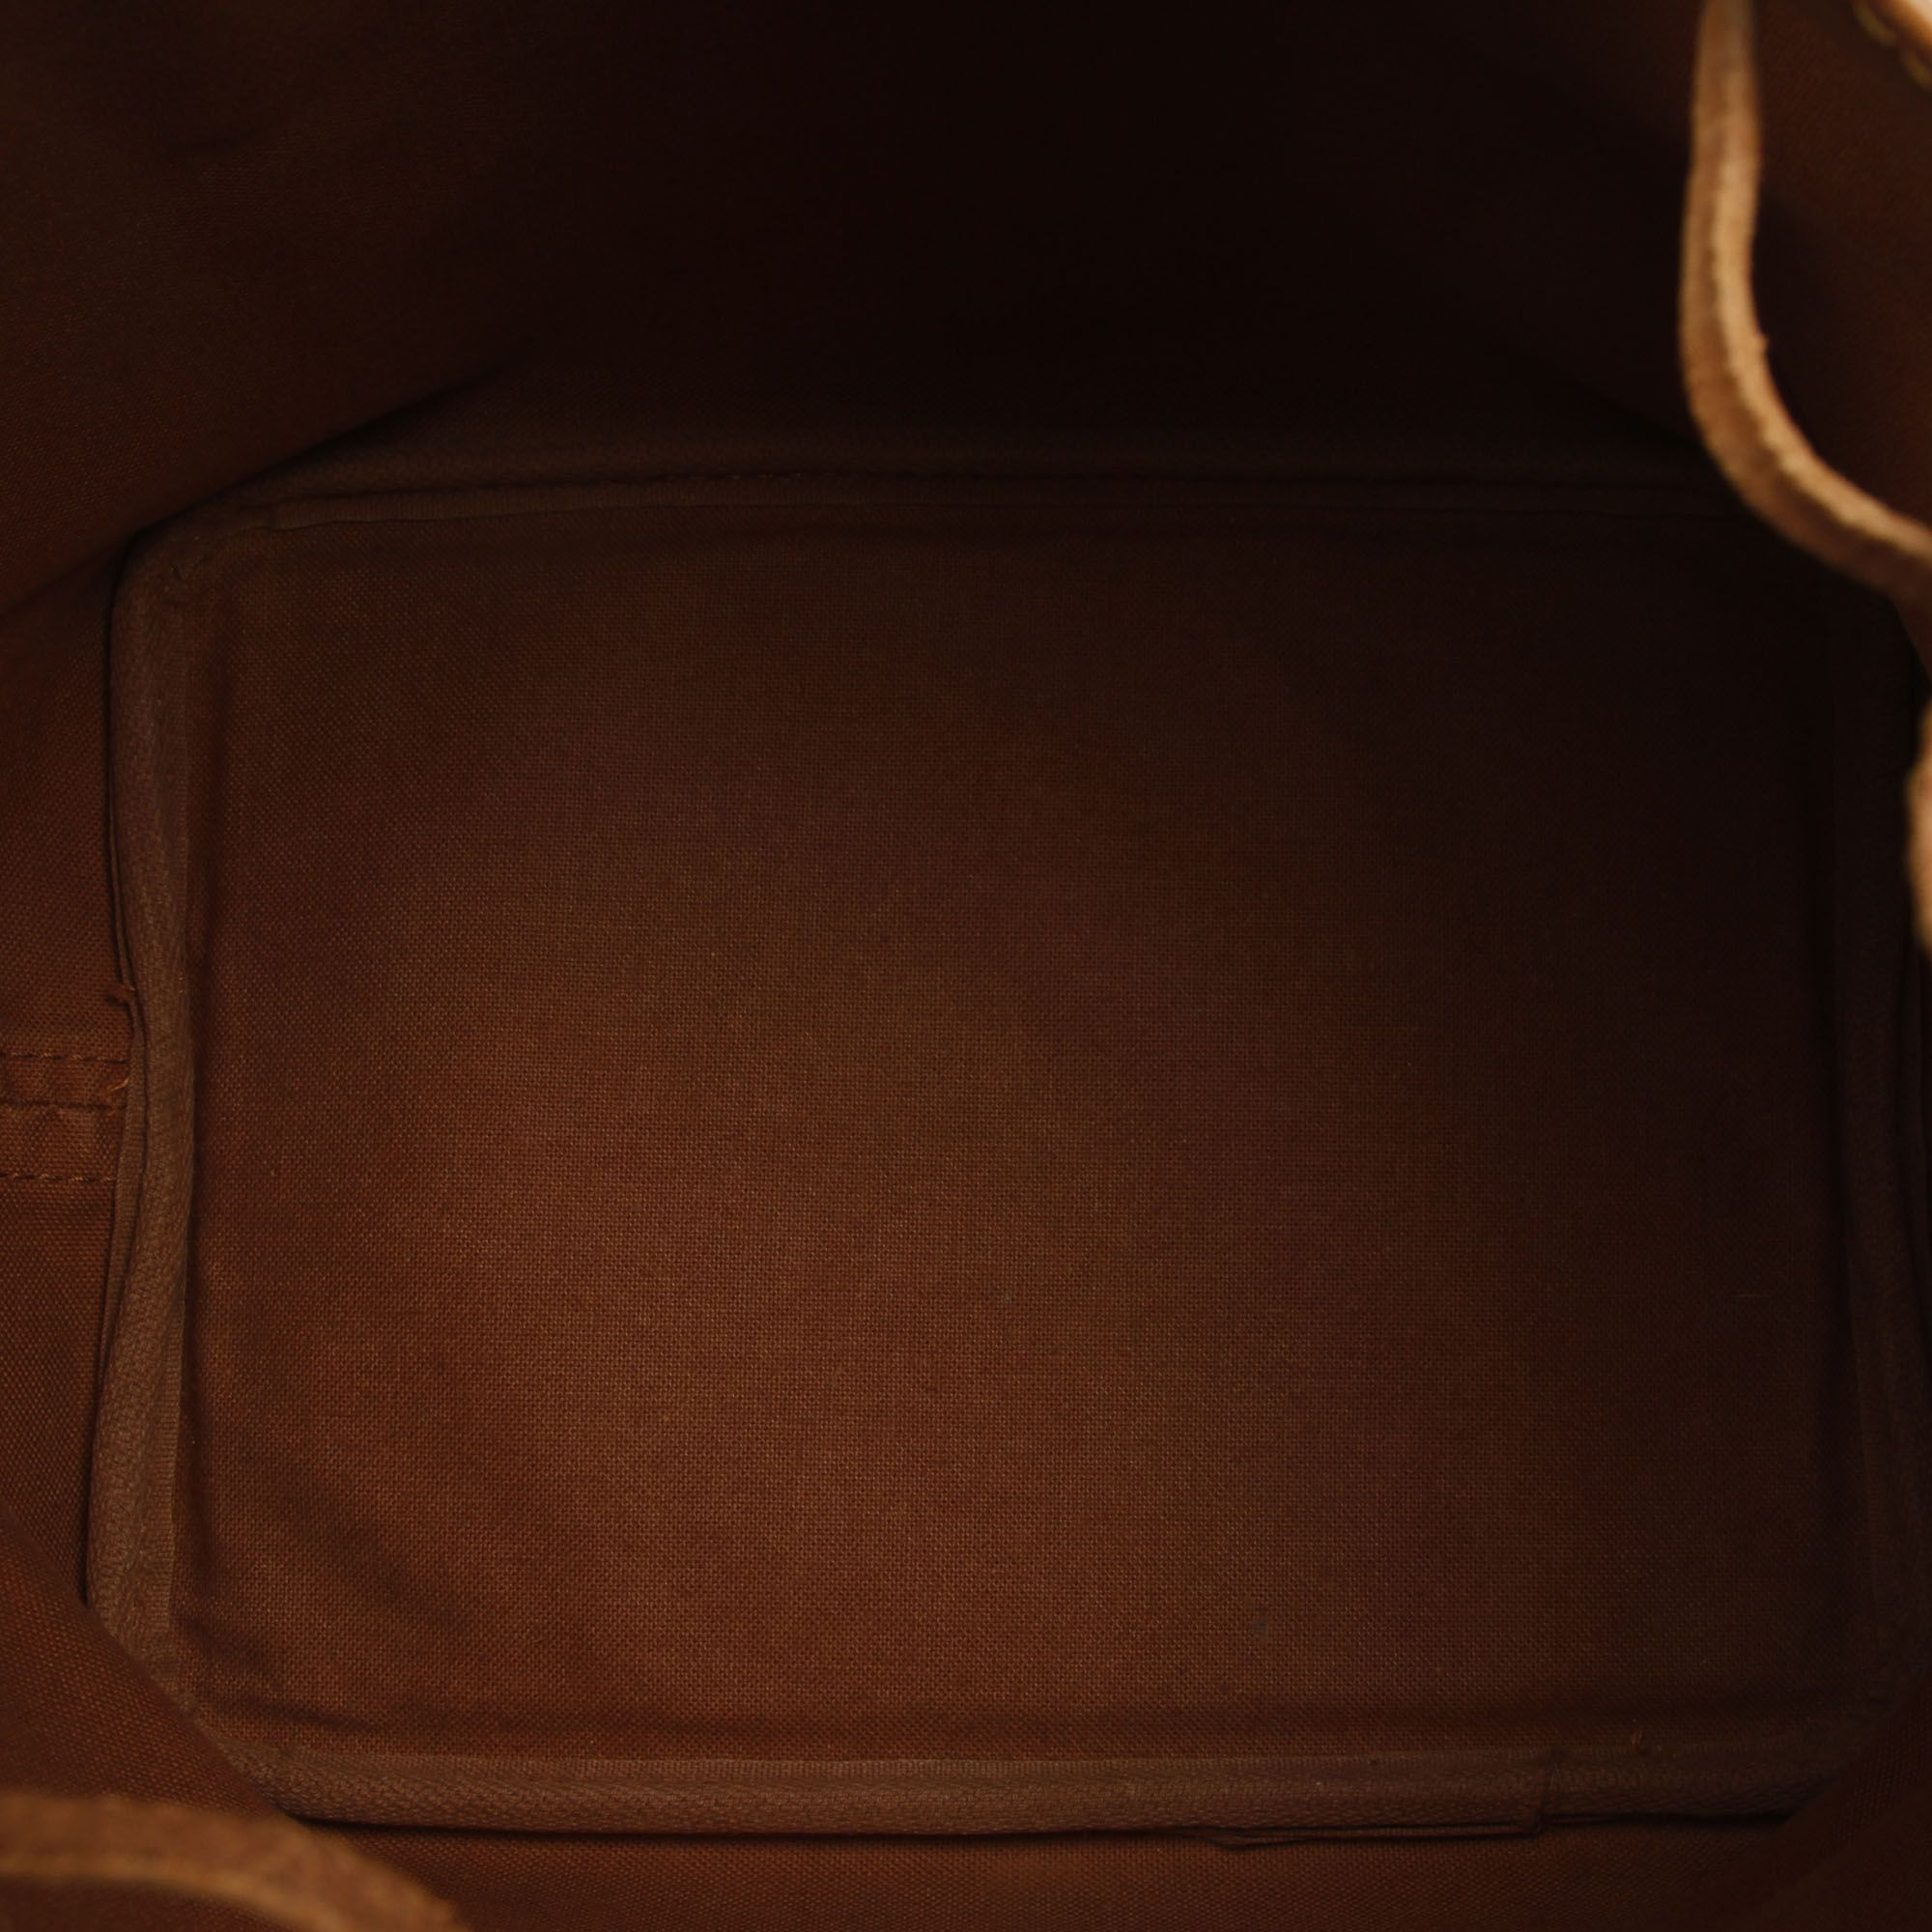 Vintage Louis Vuitton Monogram Petit Noe Brown